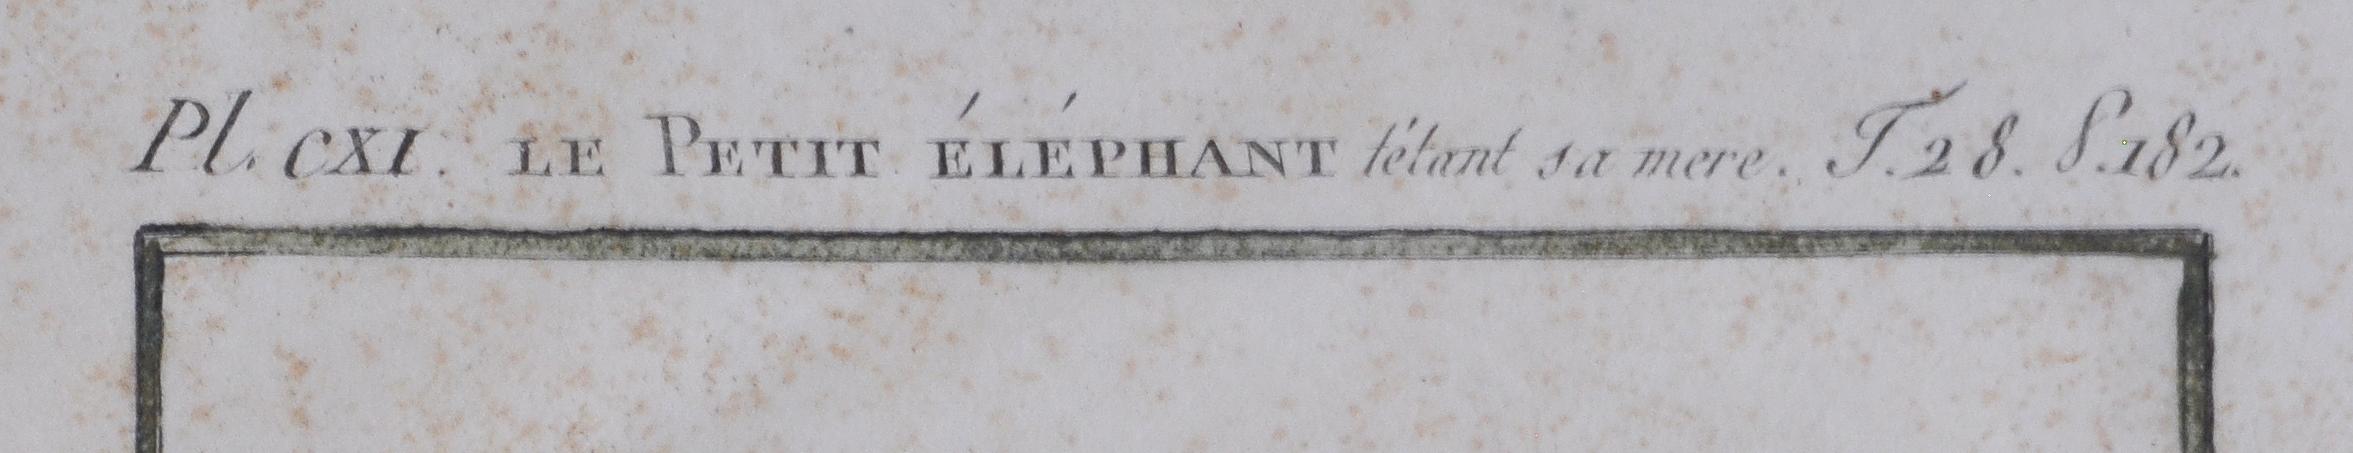 1808 The Little Elephant Antique Print From Buffon